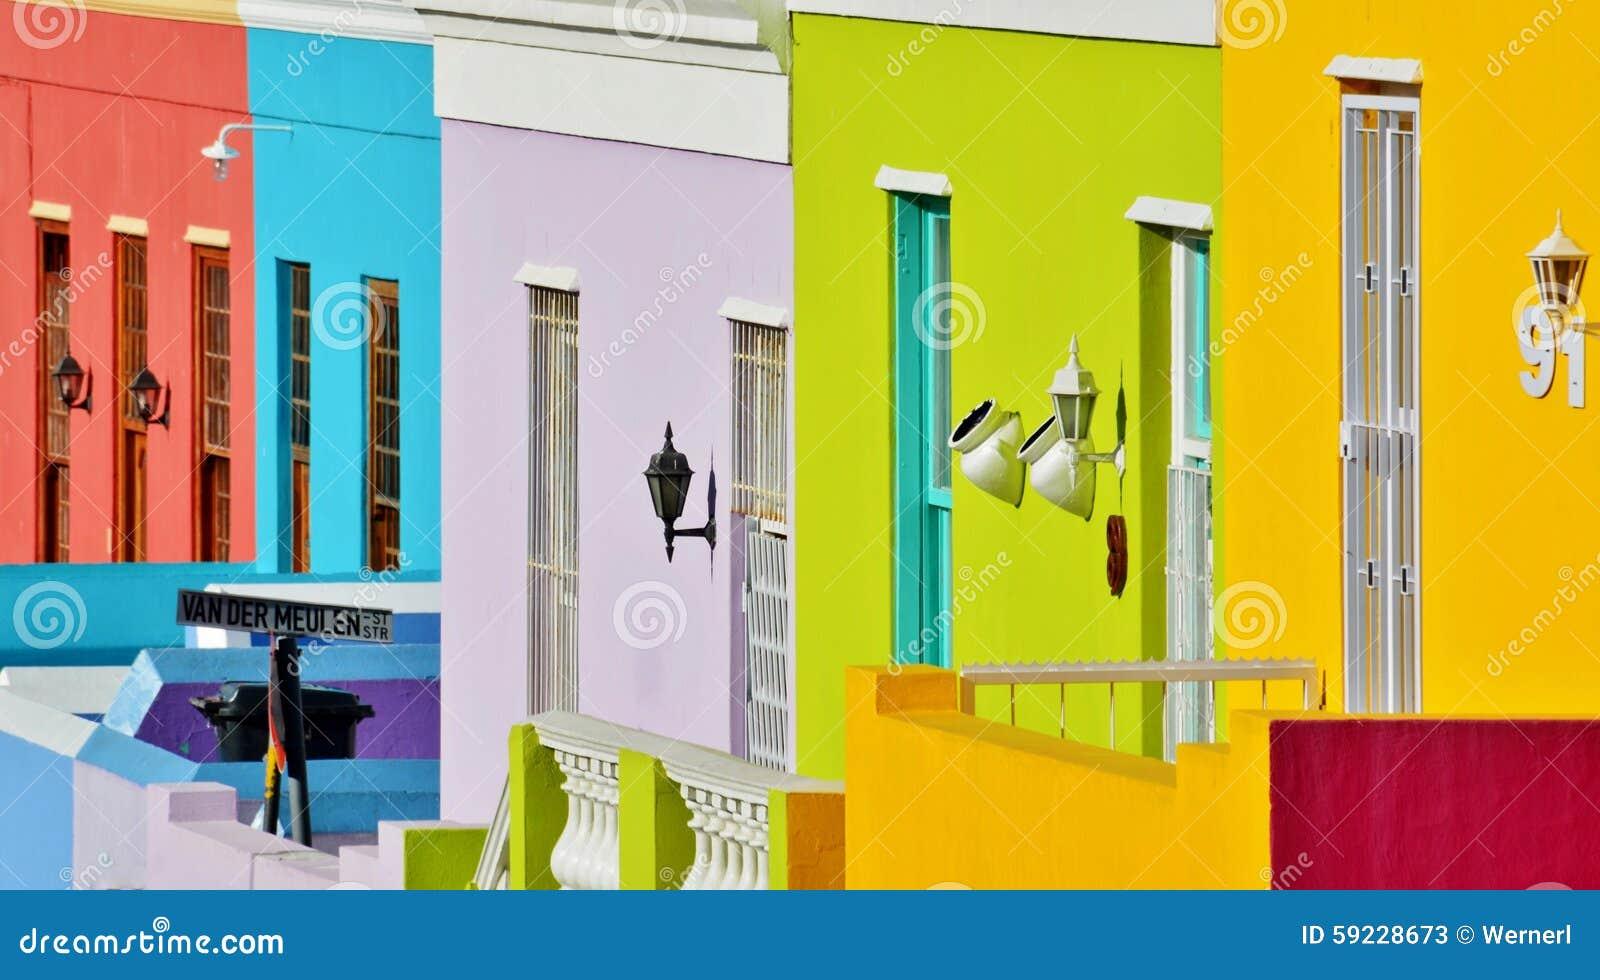 Download BO Kaap imagen de archivo. Imagen de amarillo, ventana - 59228673